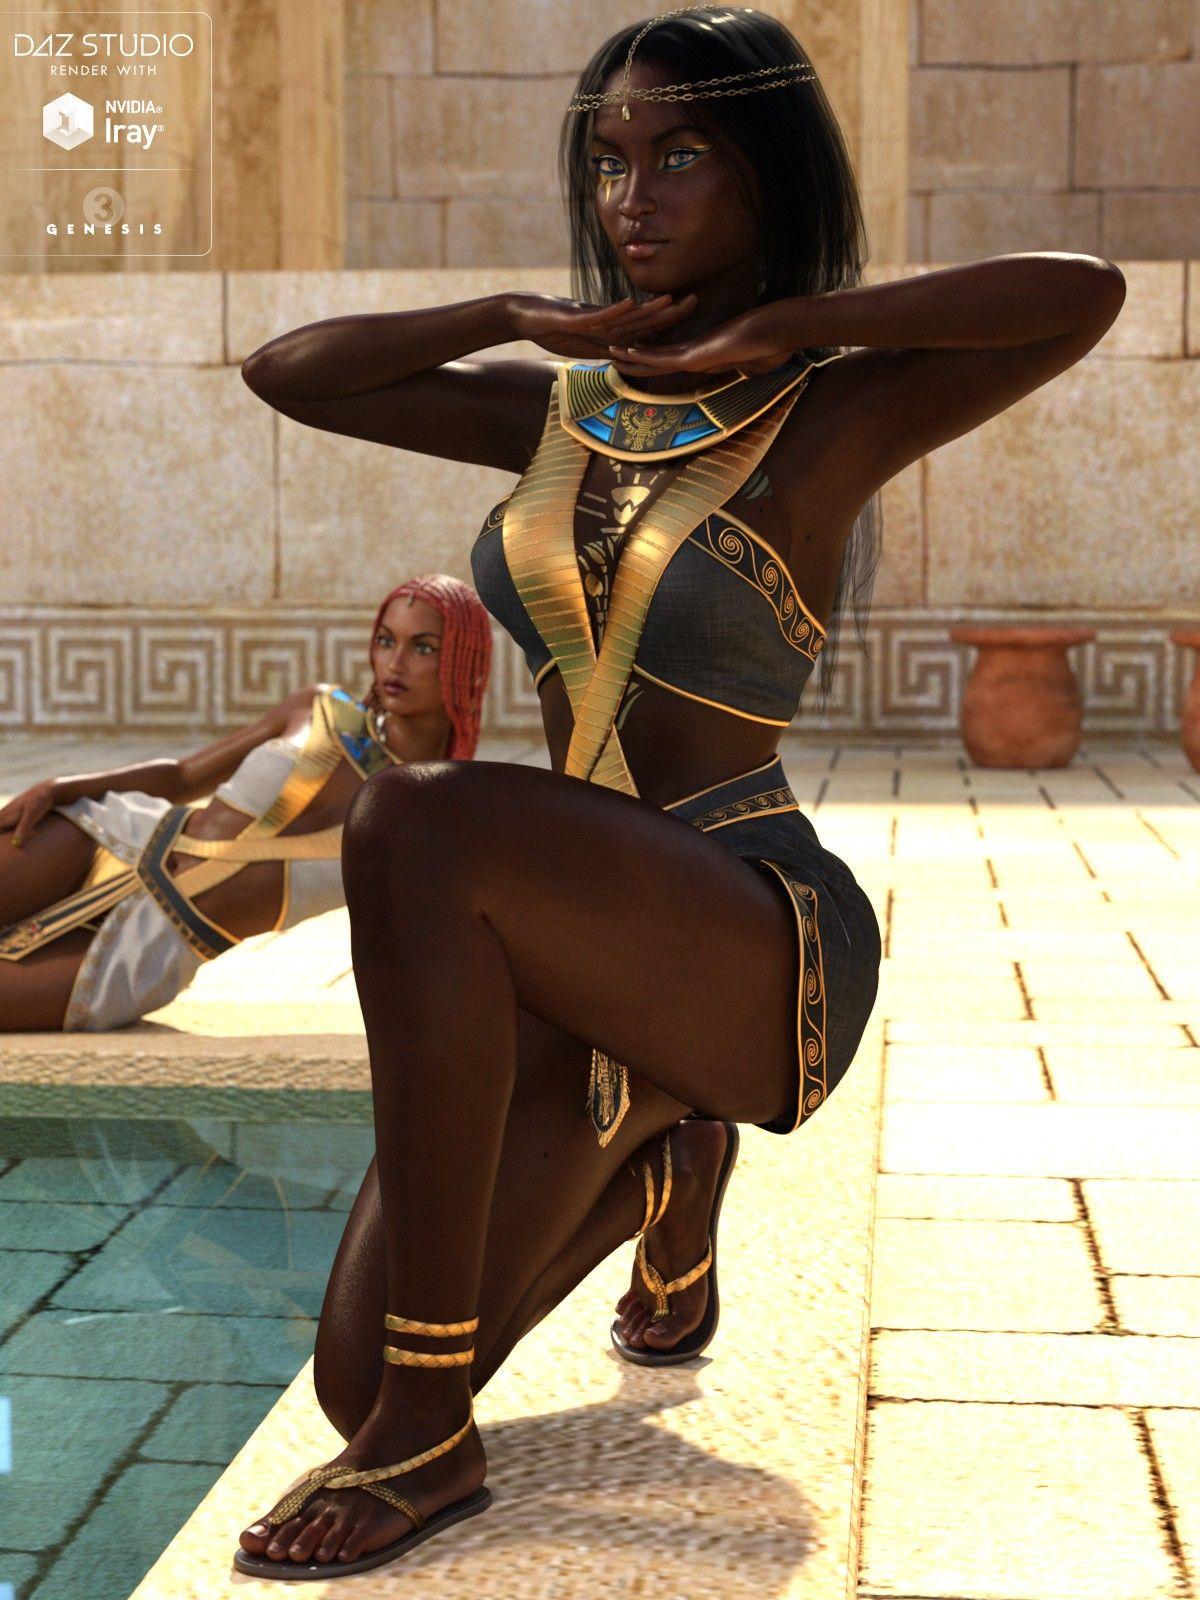 Egyptian MEGA Bundle - Characters, Outfits, Hair, Poses